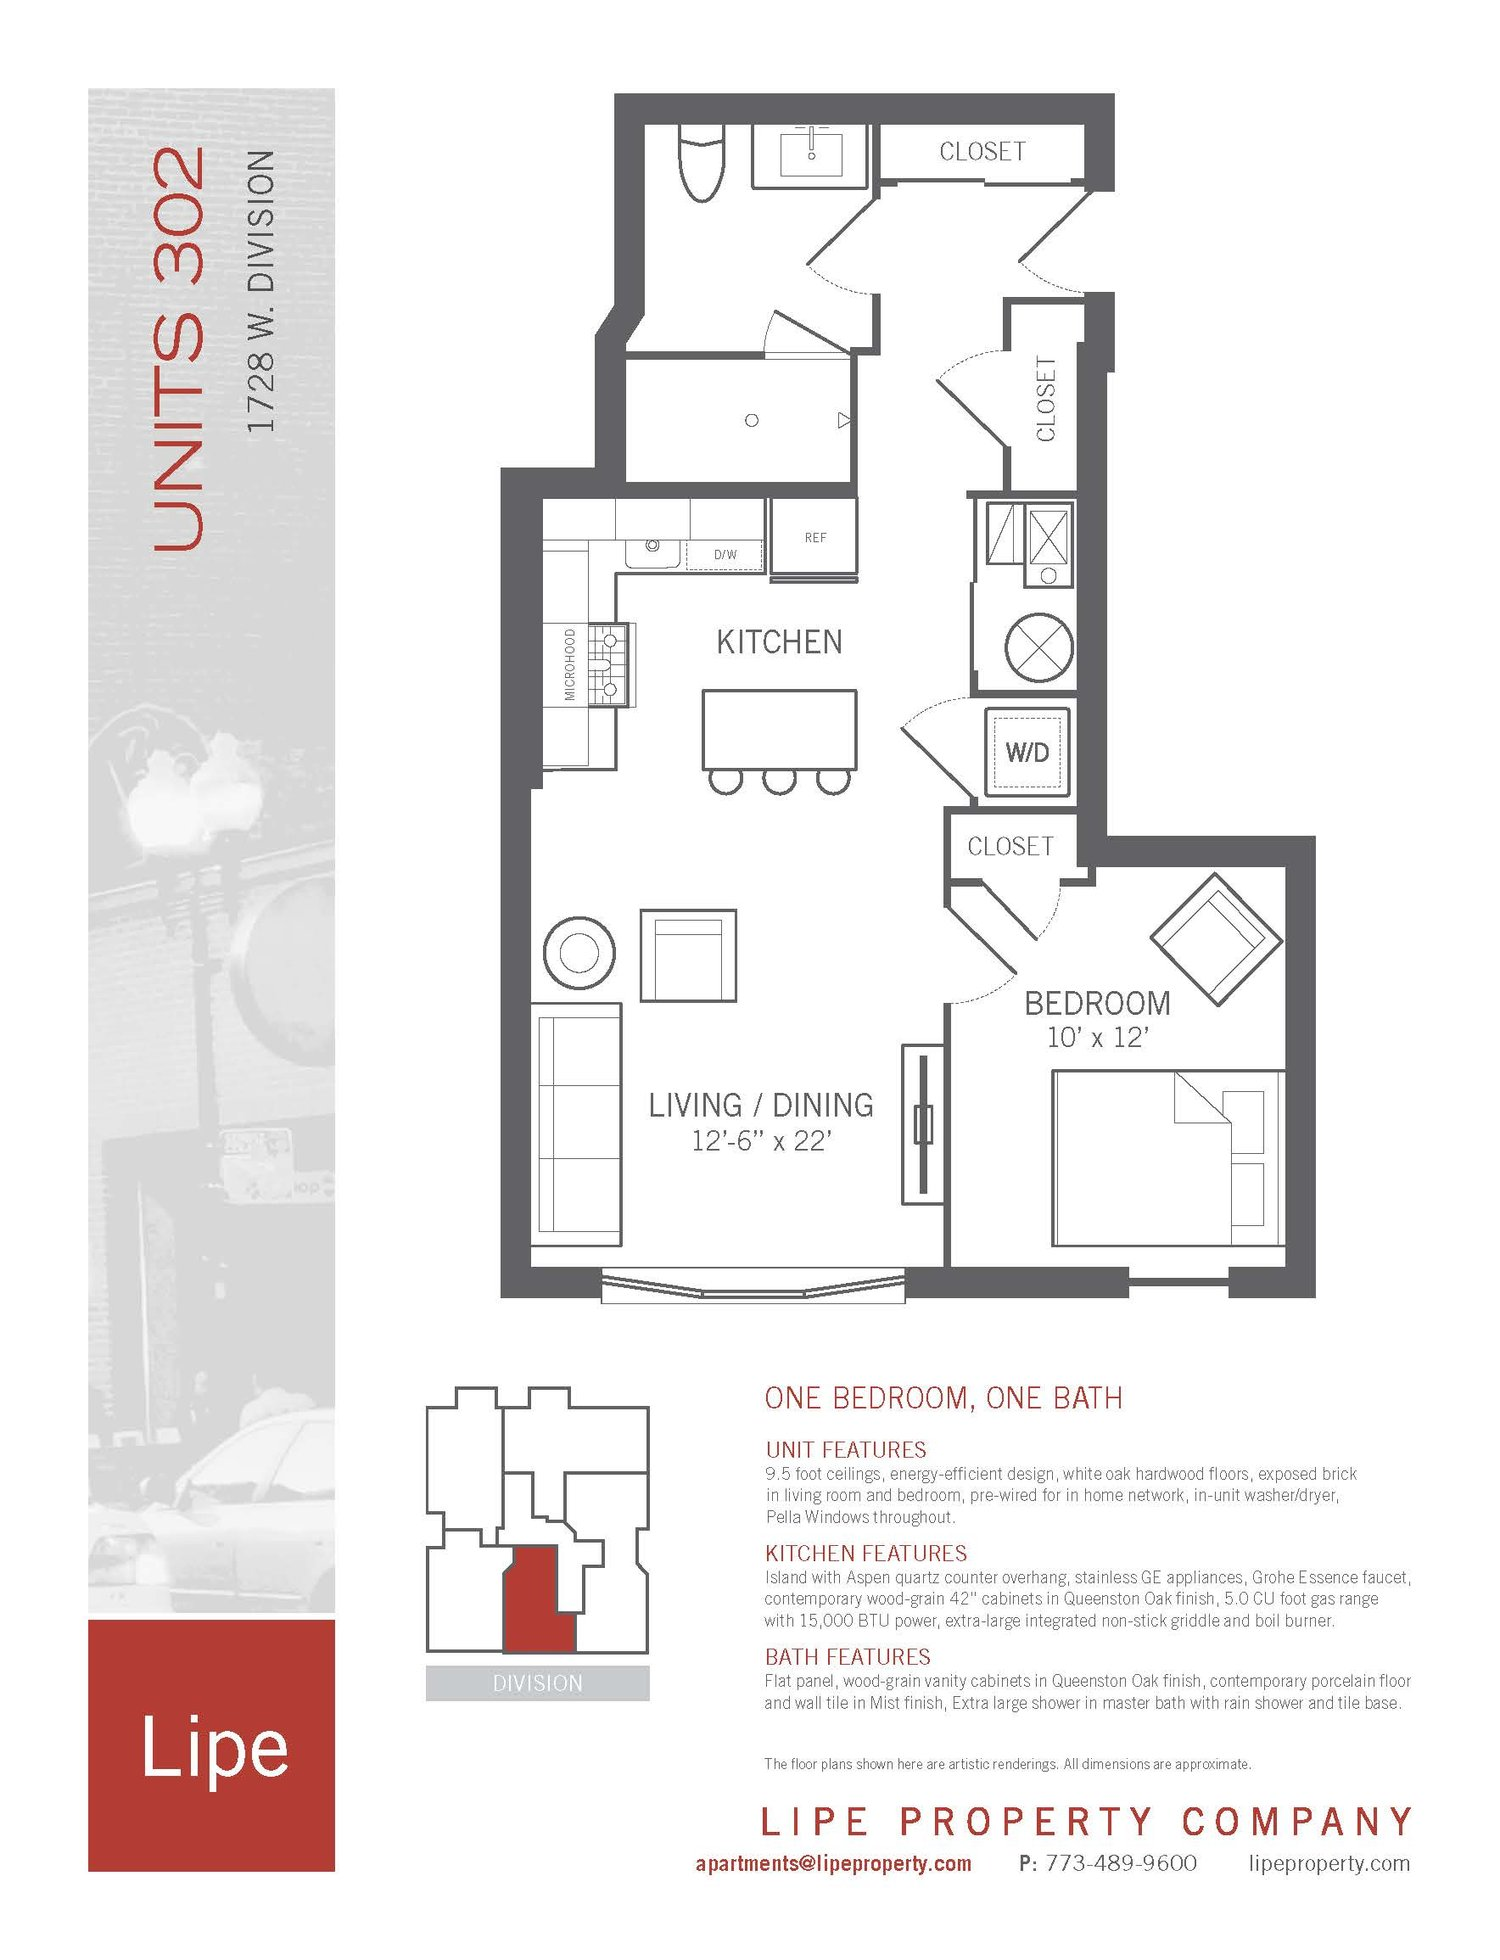 1728-West-Division-302-Floorplan-Chicago-apartment-for-rent.jpg